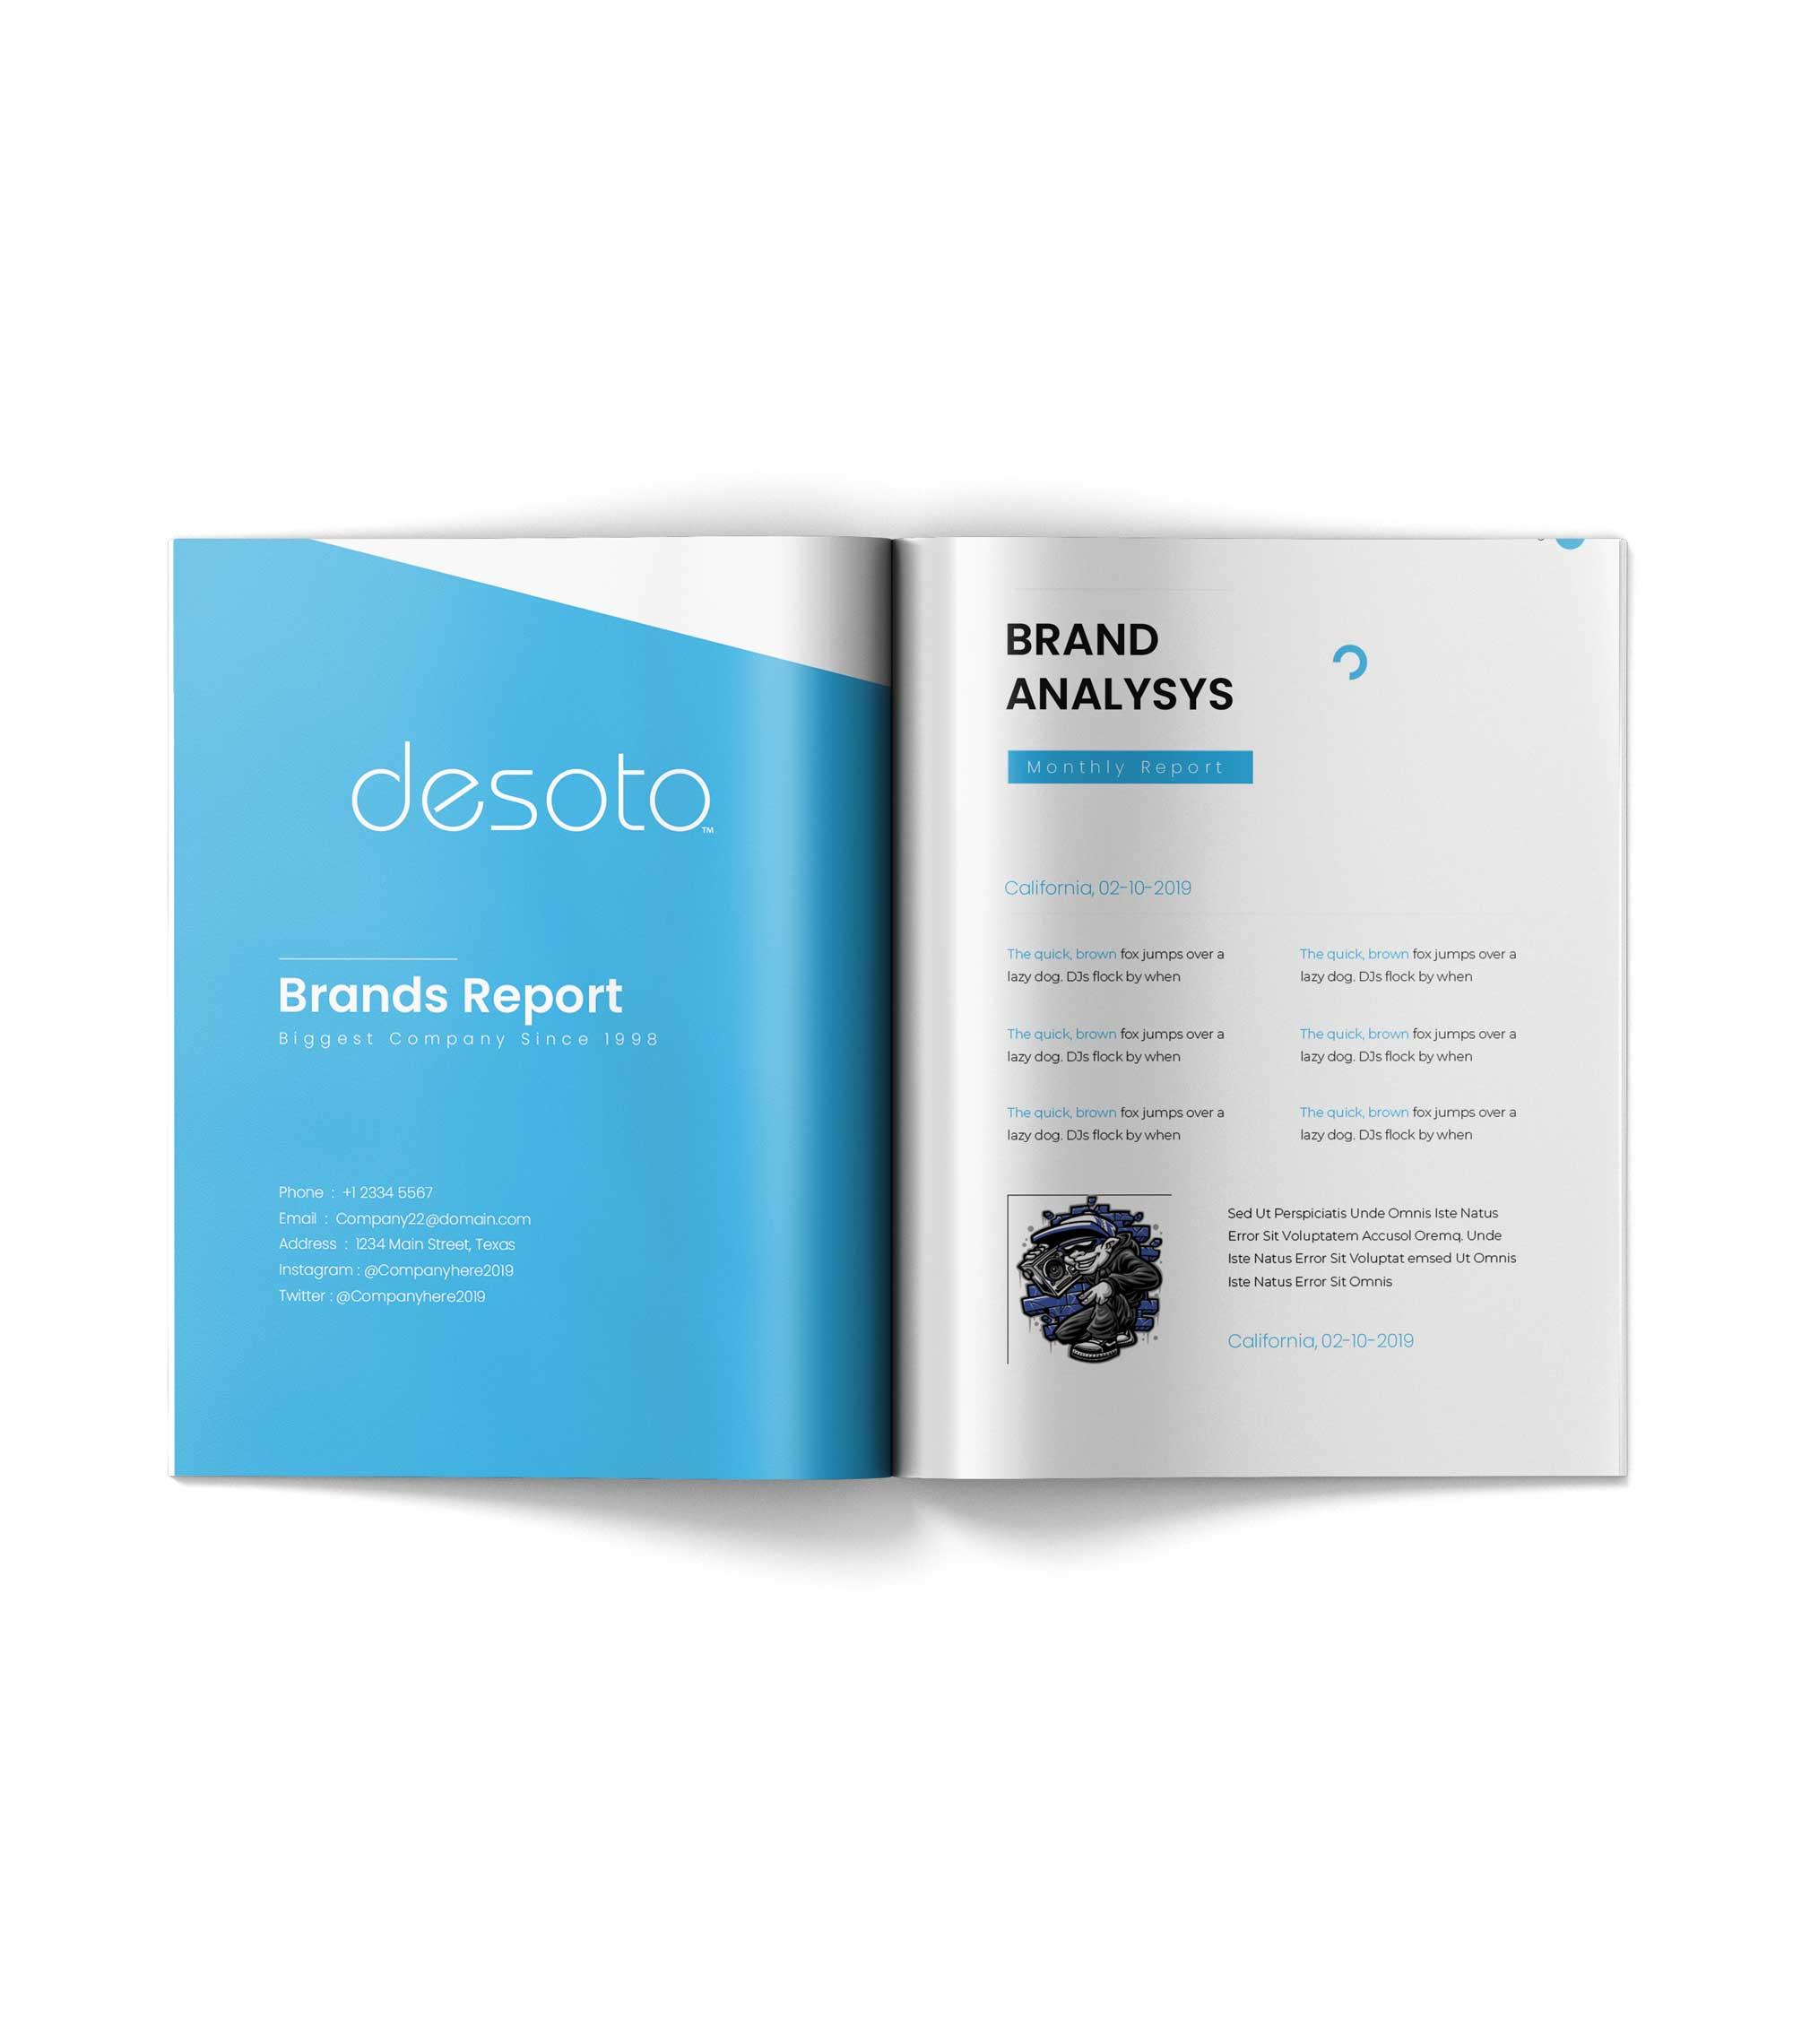 Brand analysis by DeSoto LLC